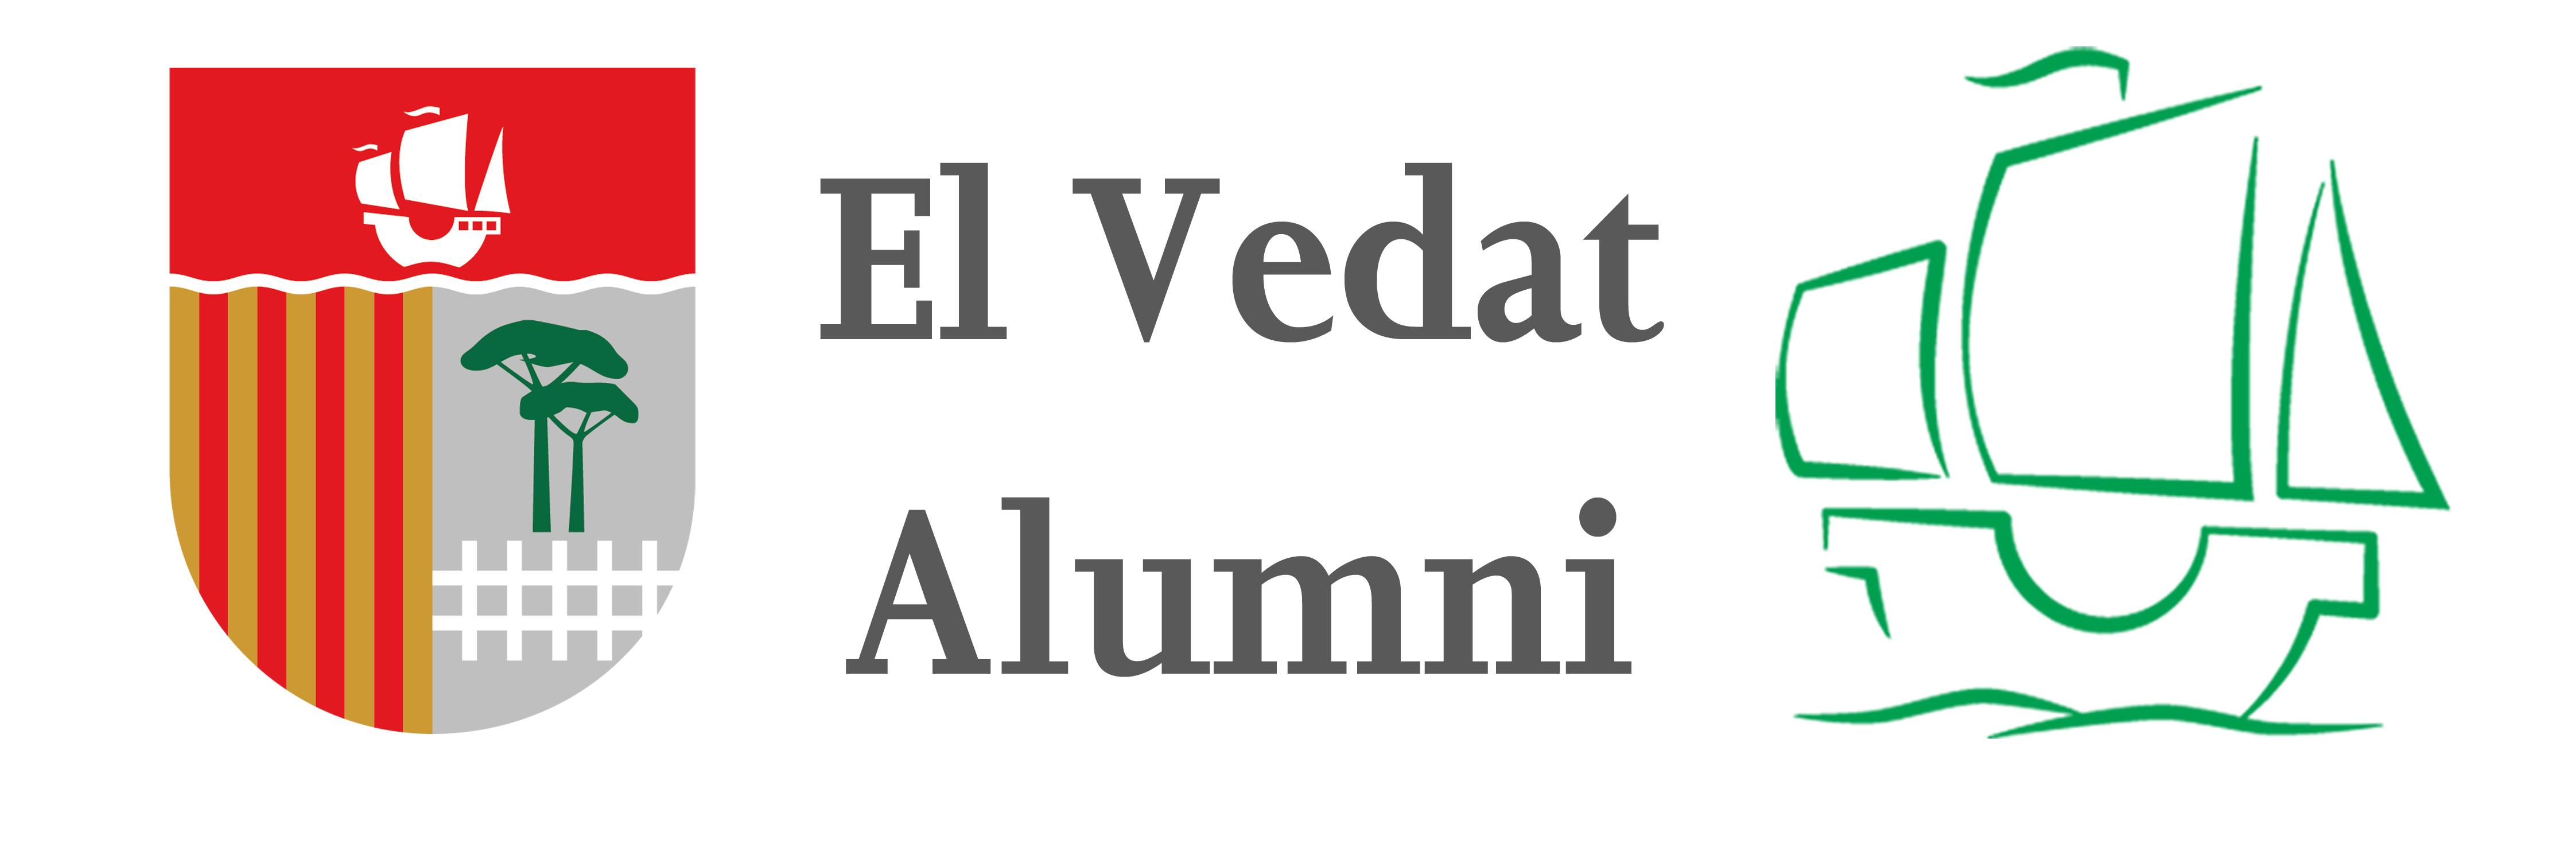 El Vedat Alumni